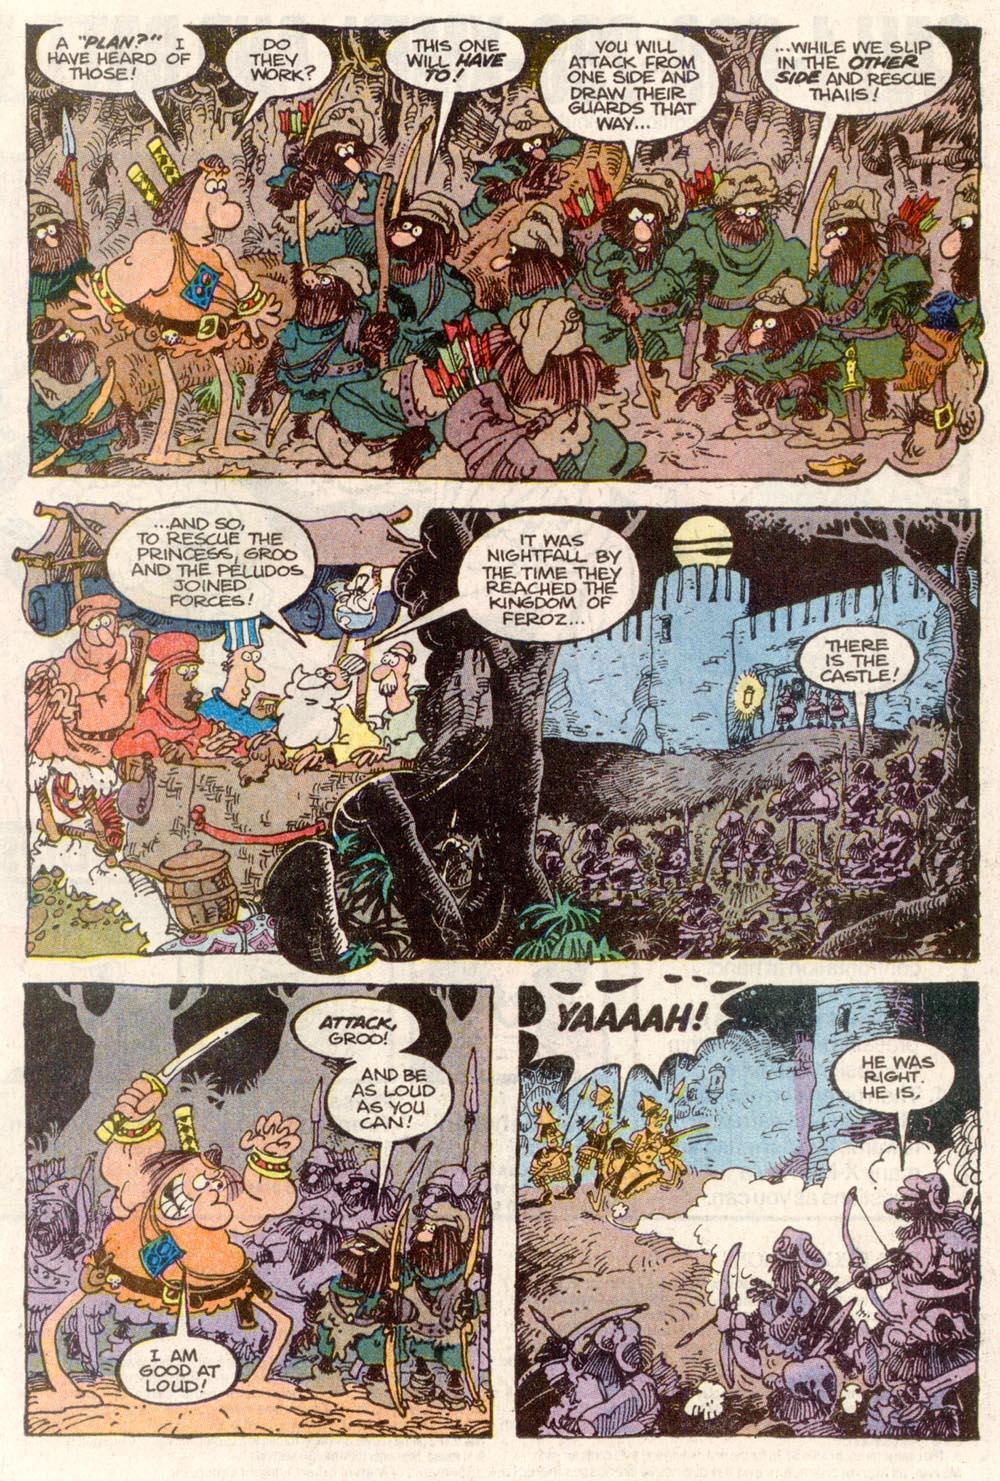 Read online Sergio Aragonés Groo the Wanderer comic -  Issue #82 - 14